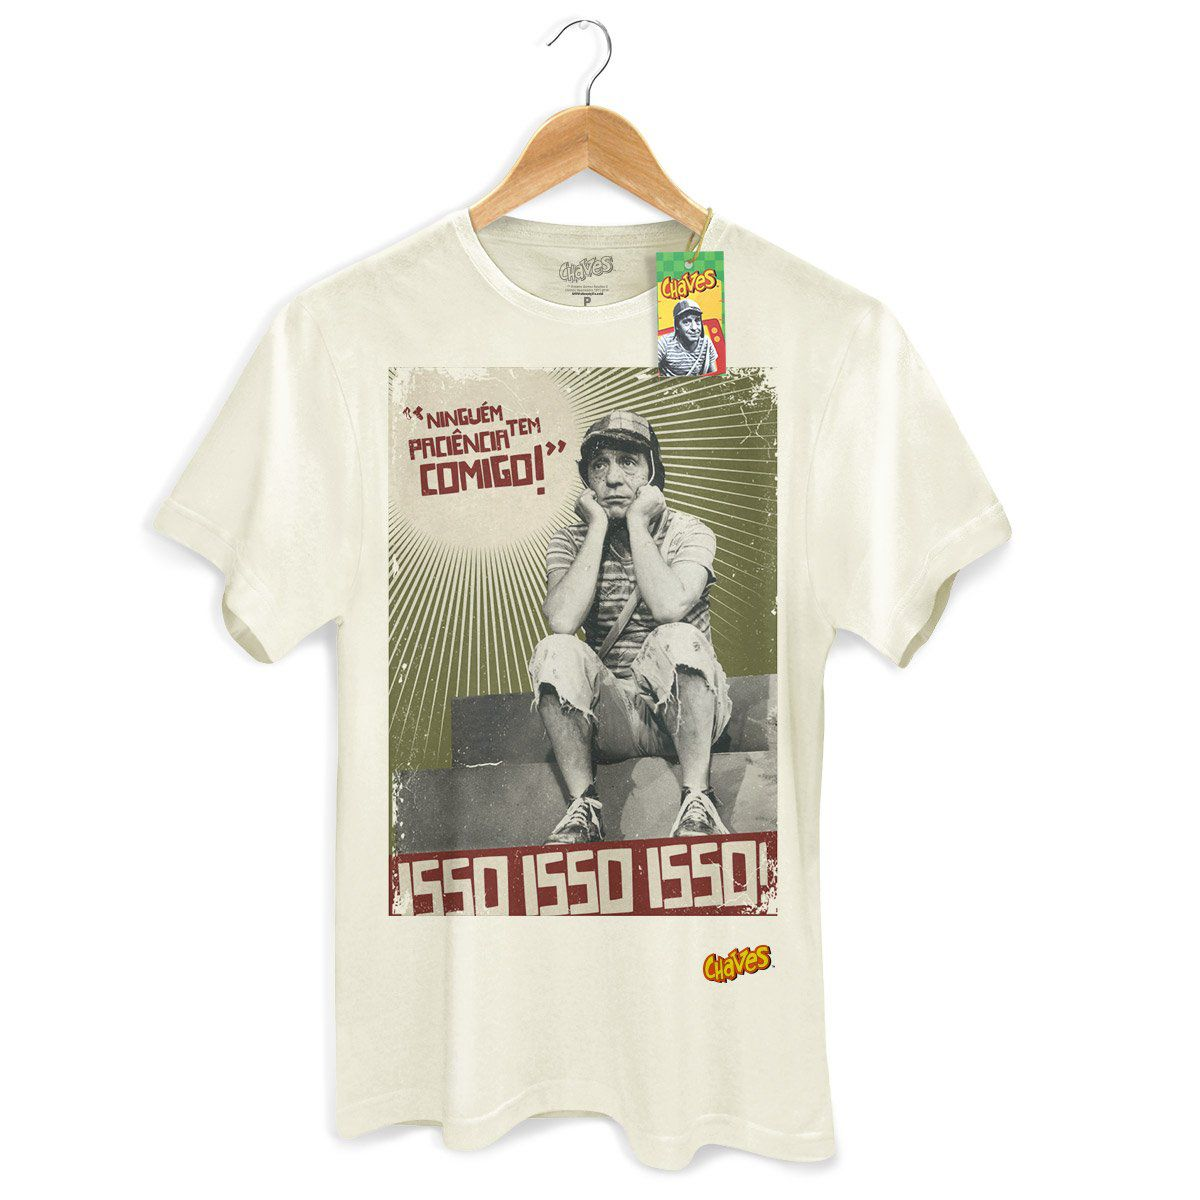 Camiseta Masculina Chaves Ninguém Tem Paciência Comigo! 2  - bandUP Store Marketplace